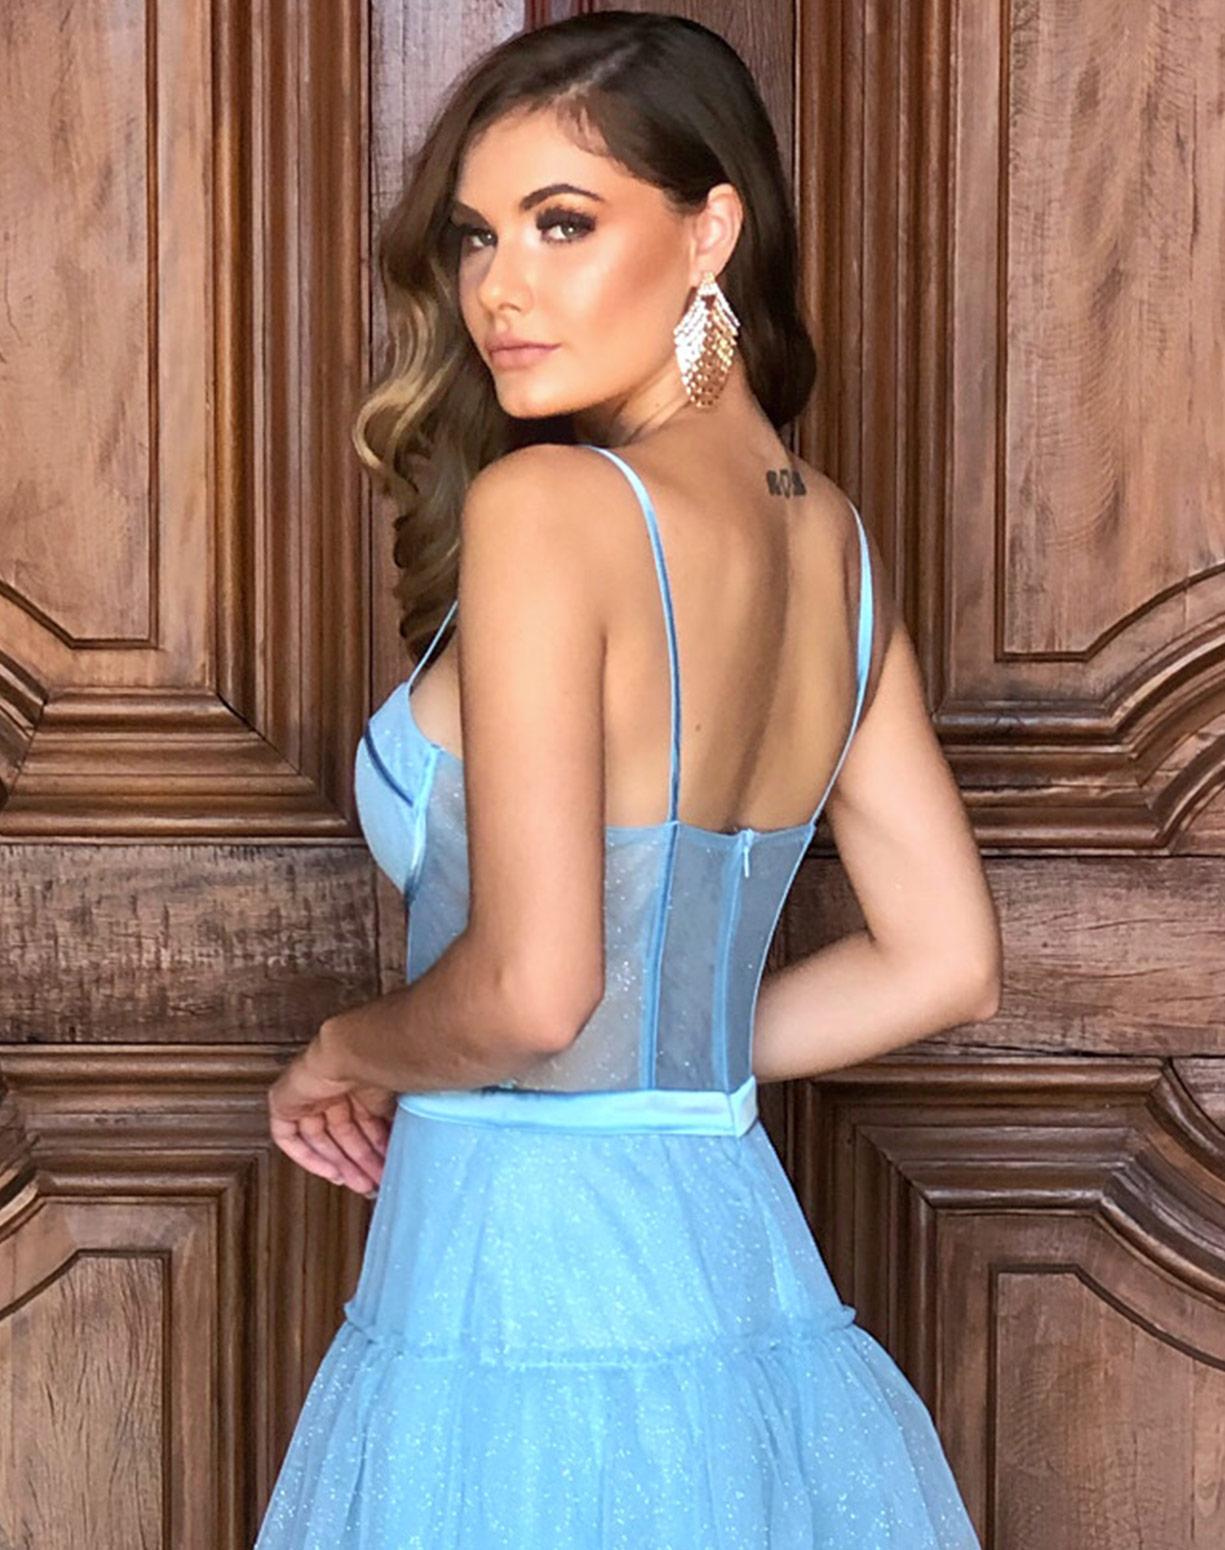 Vestido Azul Serenity em Tule Glitter com Corpete